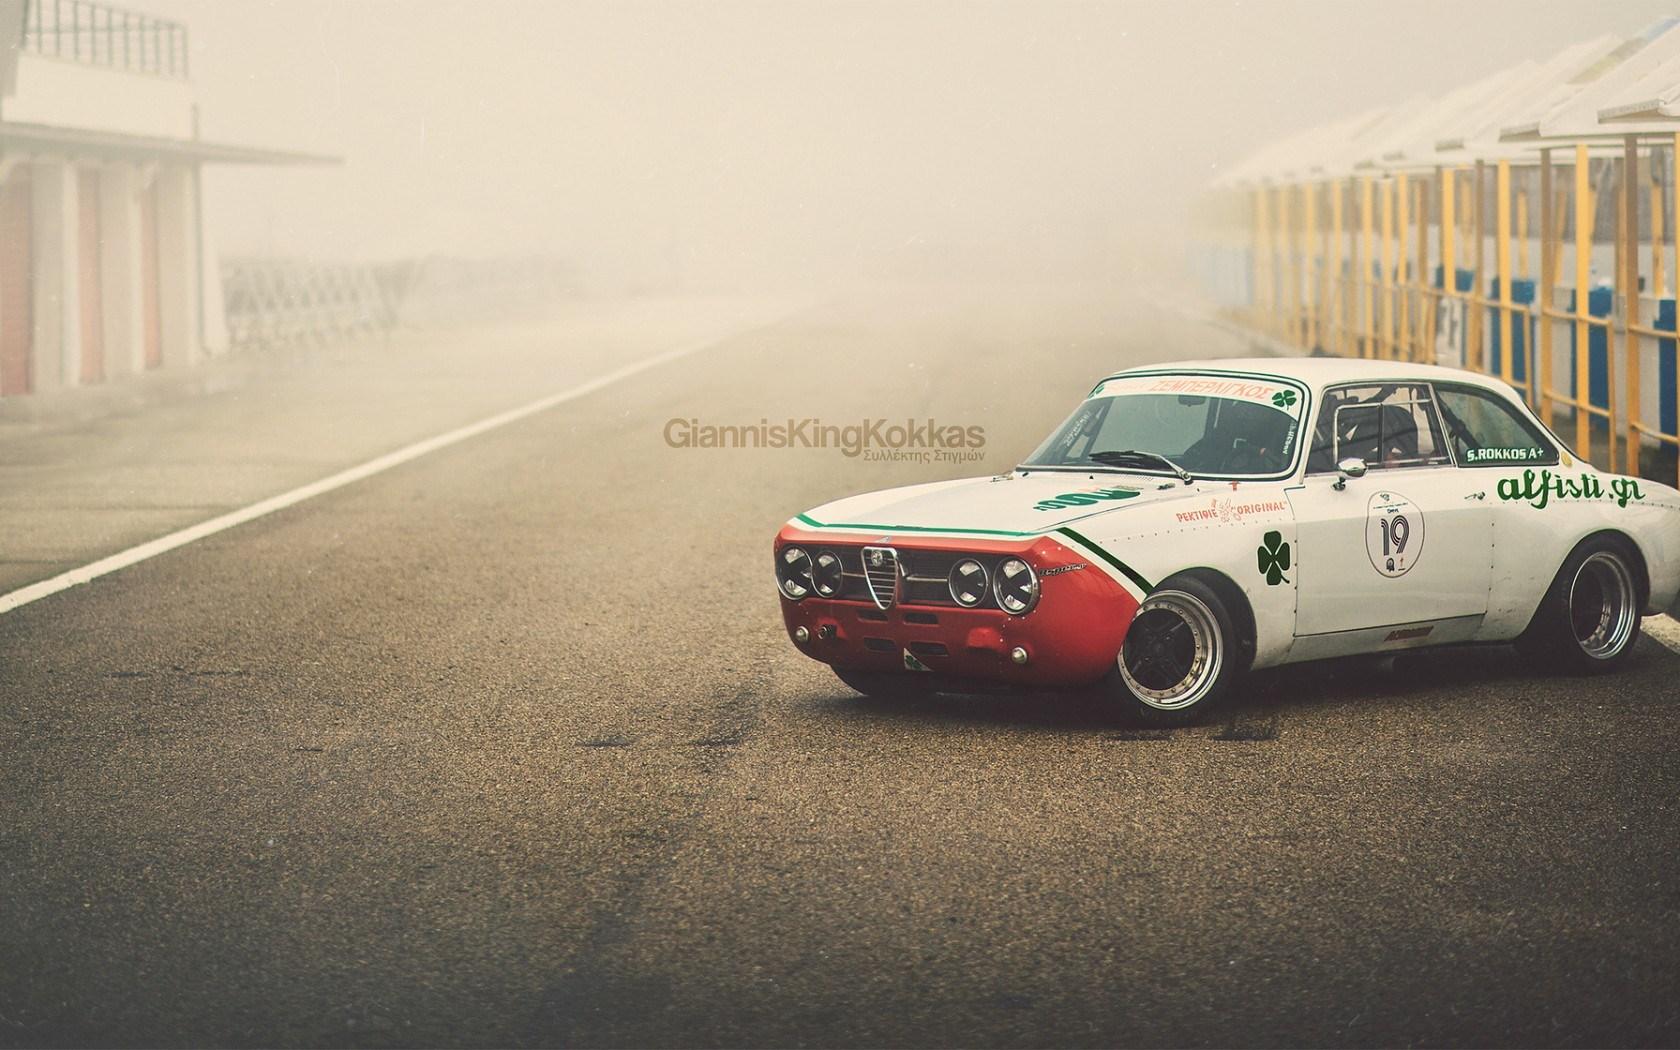 Alfa Romeo Giulia 1750 GTAm 1970 Retro Oldschool Racecar